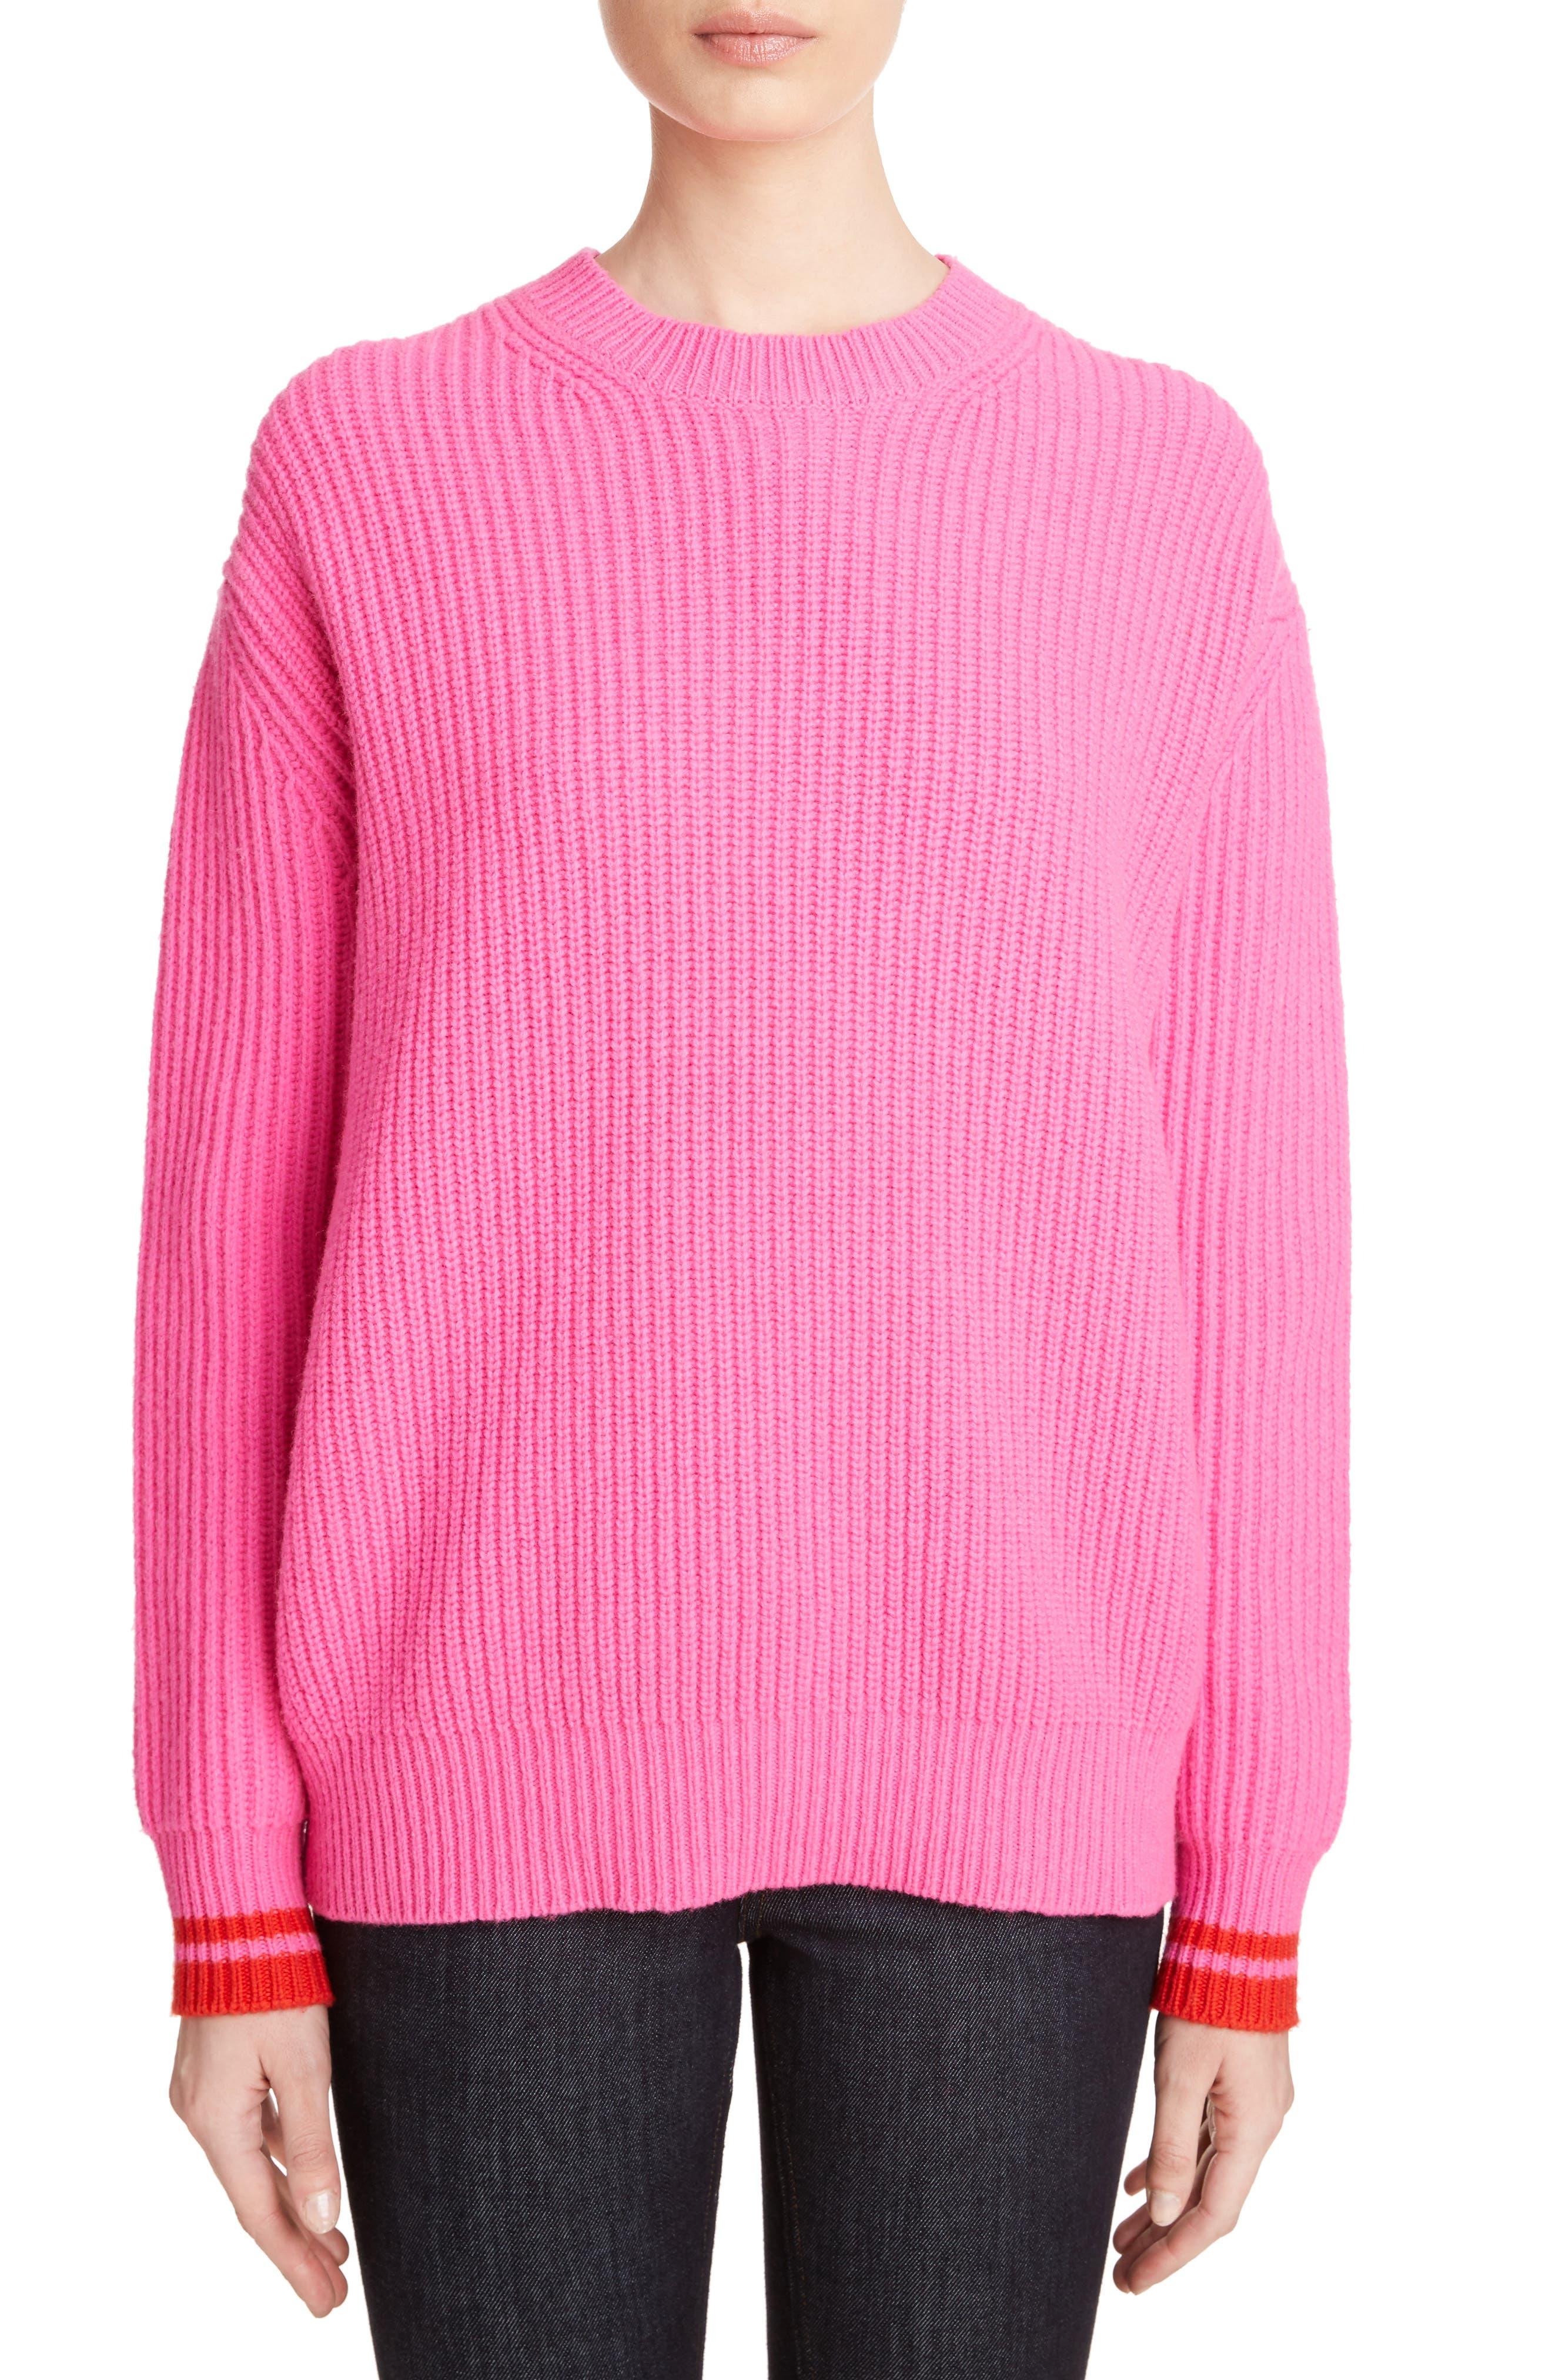 Lambswool Boyfriend Sweater,                             Main thumbnail 1, color,                             650